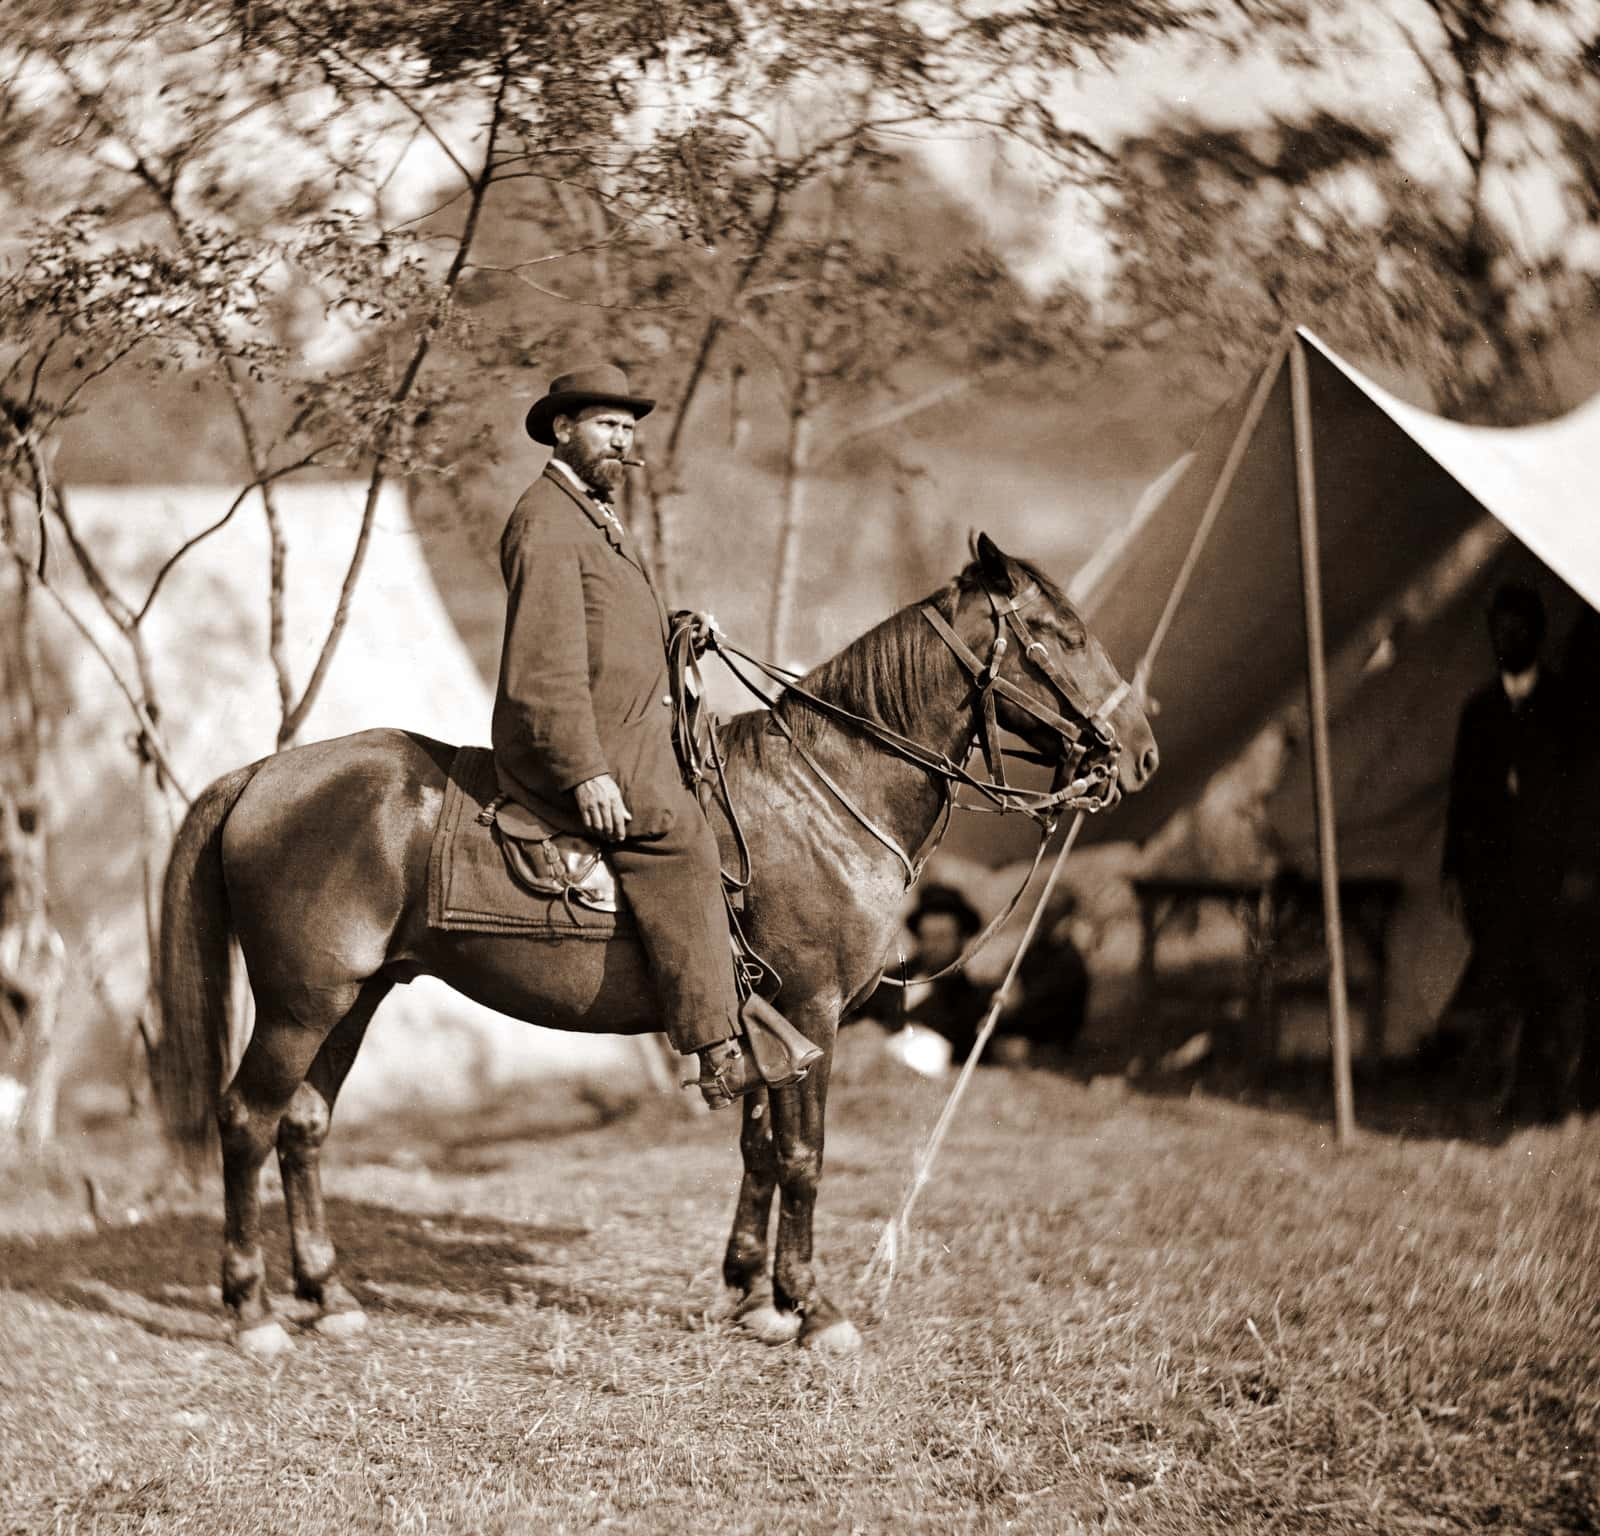 Allan Pinkerton (EJ Allen) of the Secret Service on horseback (Civil War - Antietam 1962)